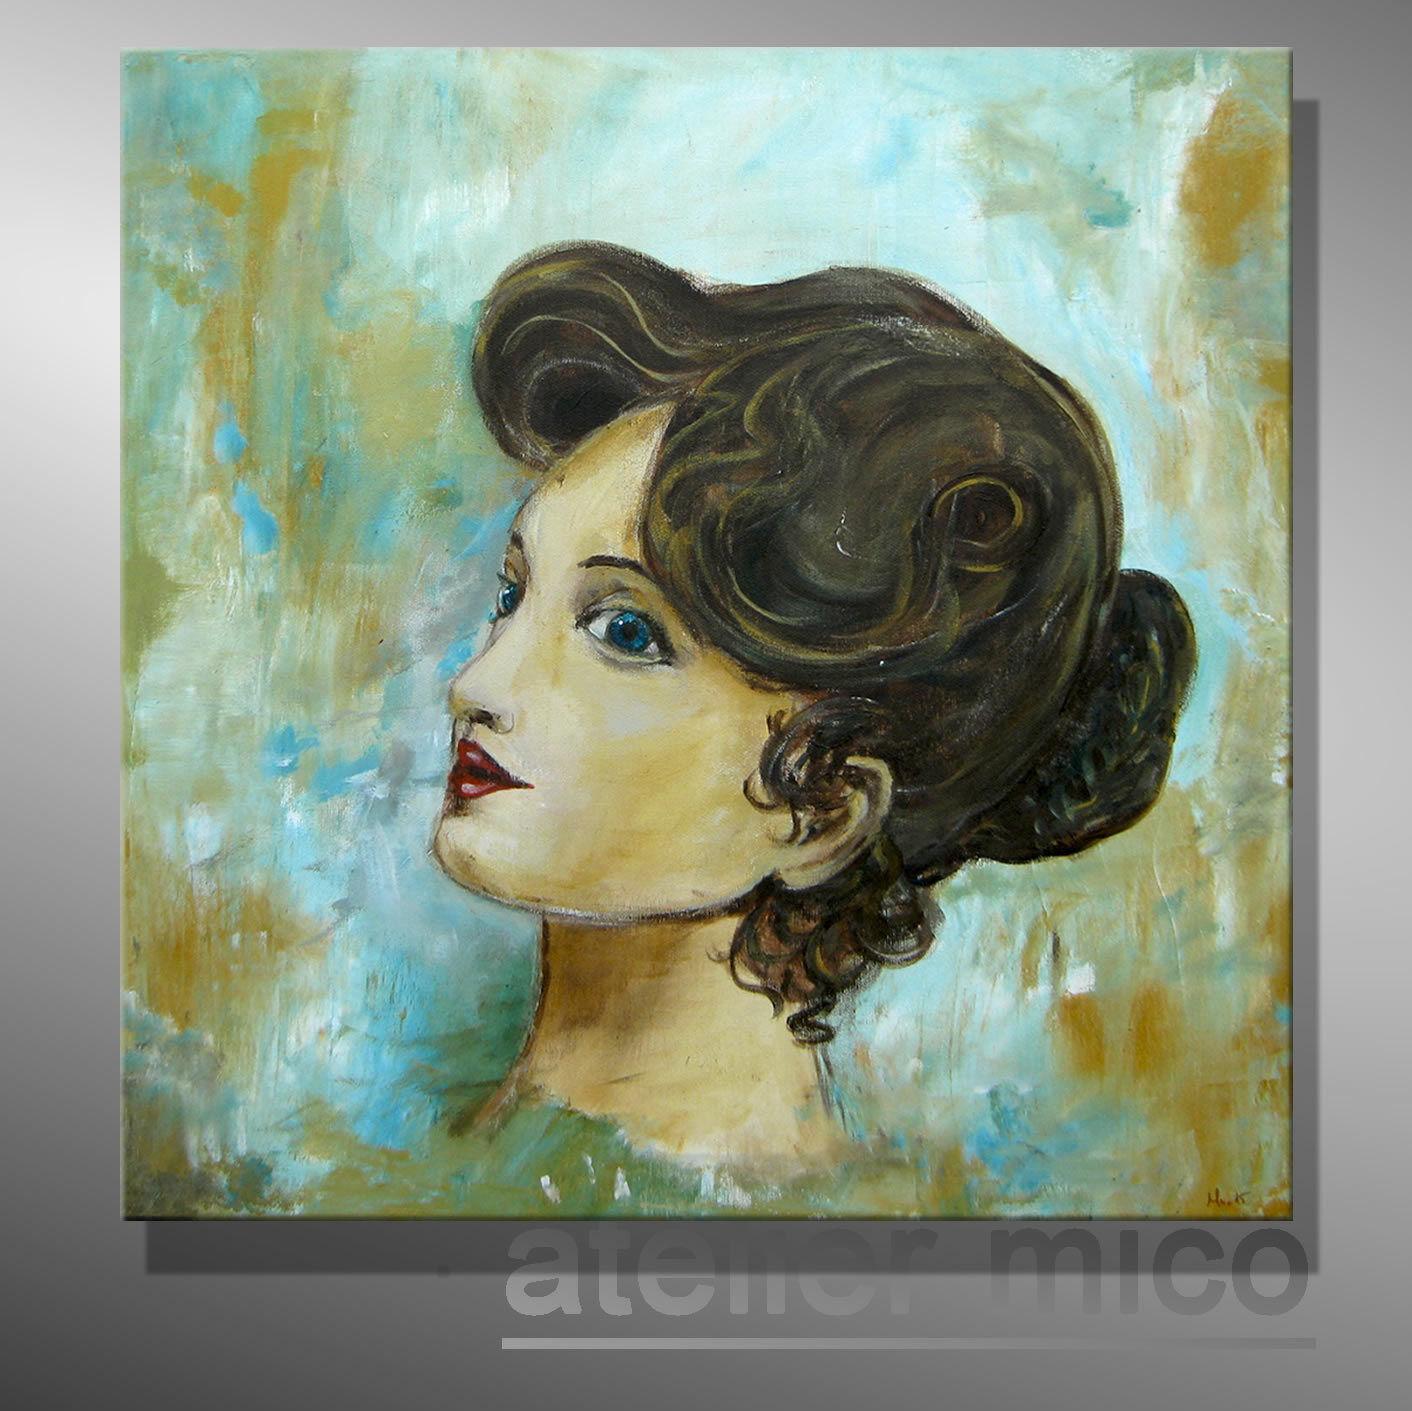 C. GOETHE ORIGINAL abstraktes Gemälde modern bilder malerei Acrylbild portrait